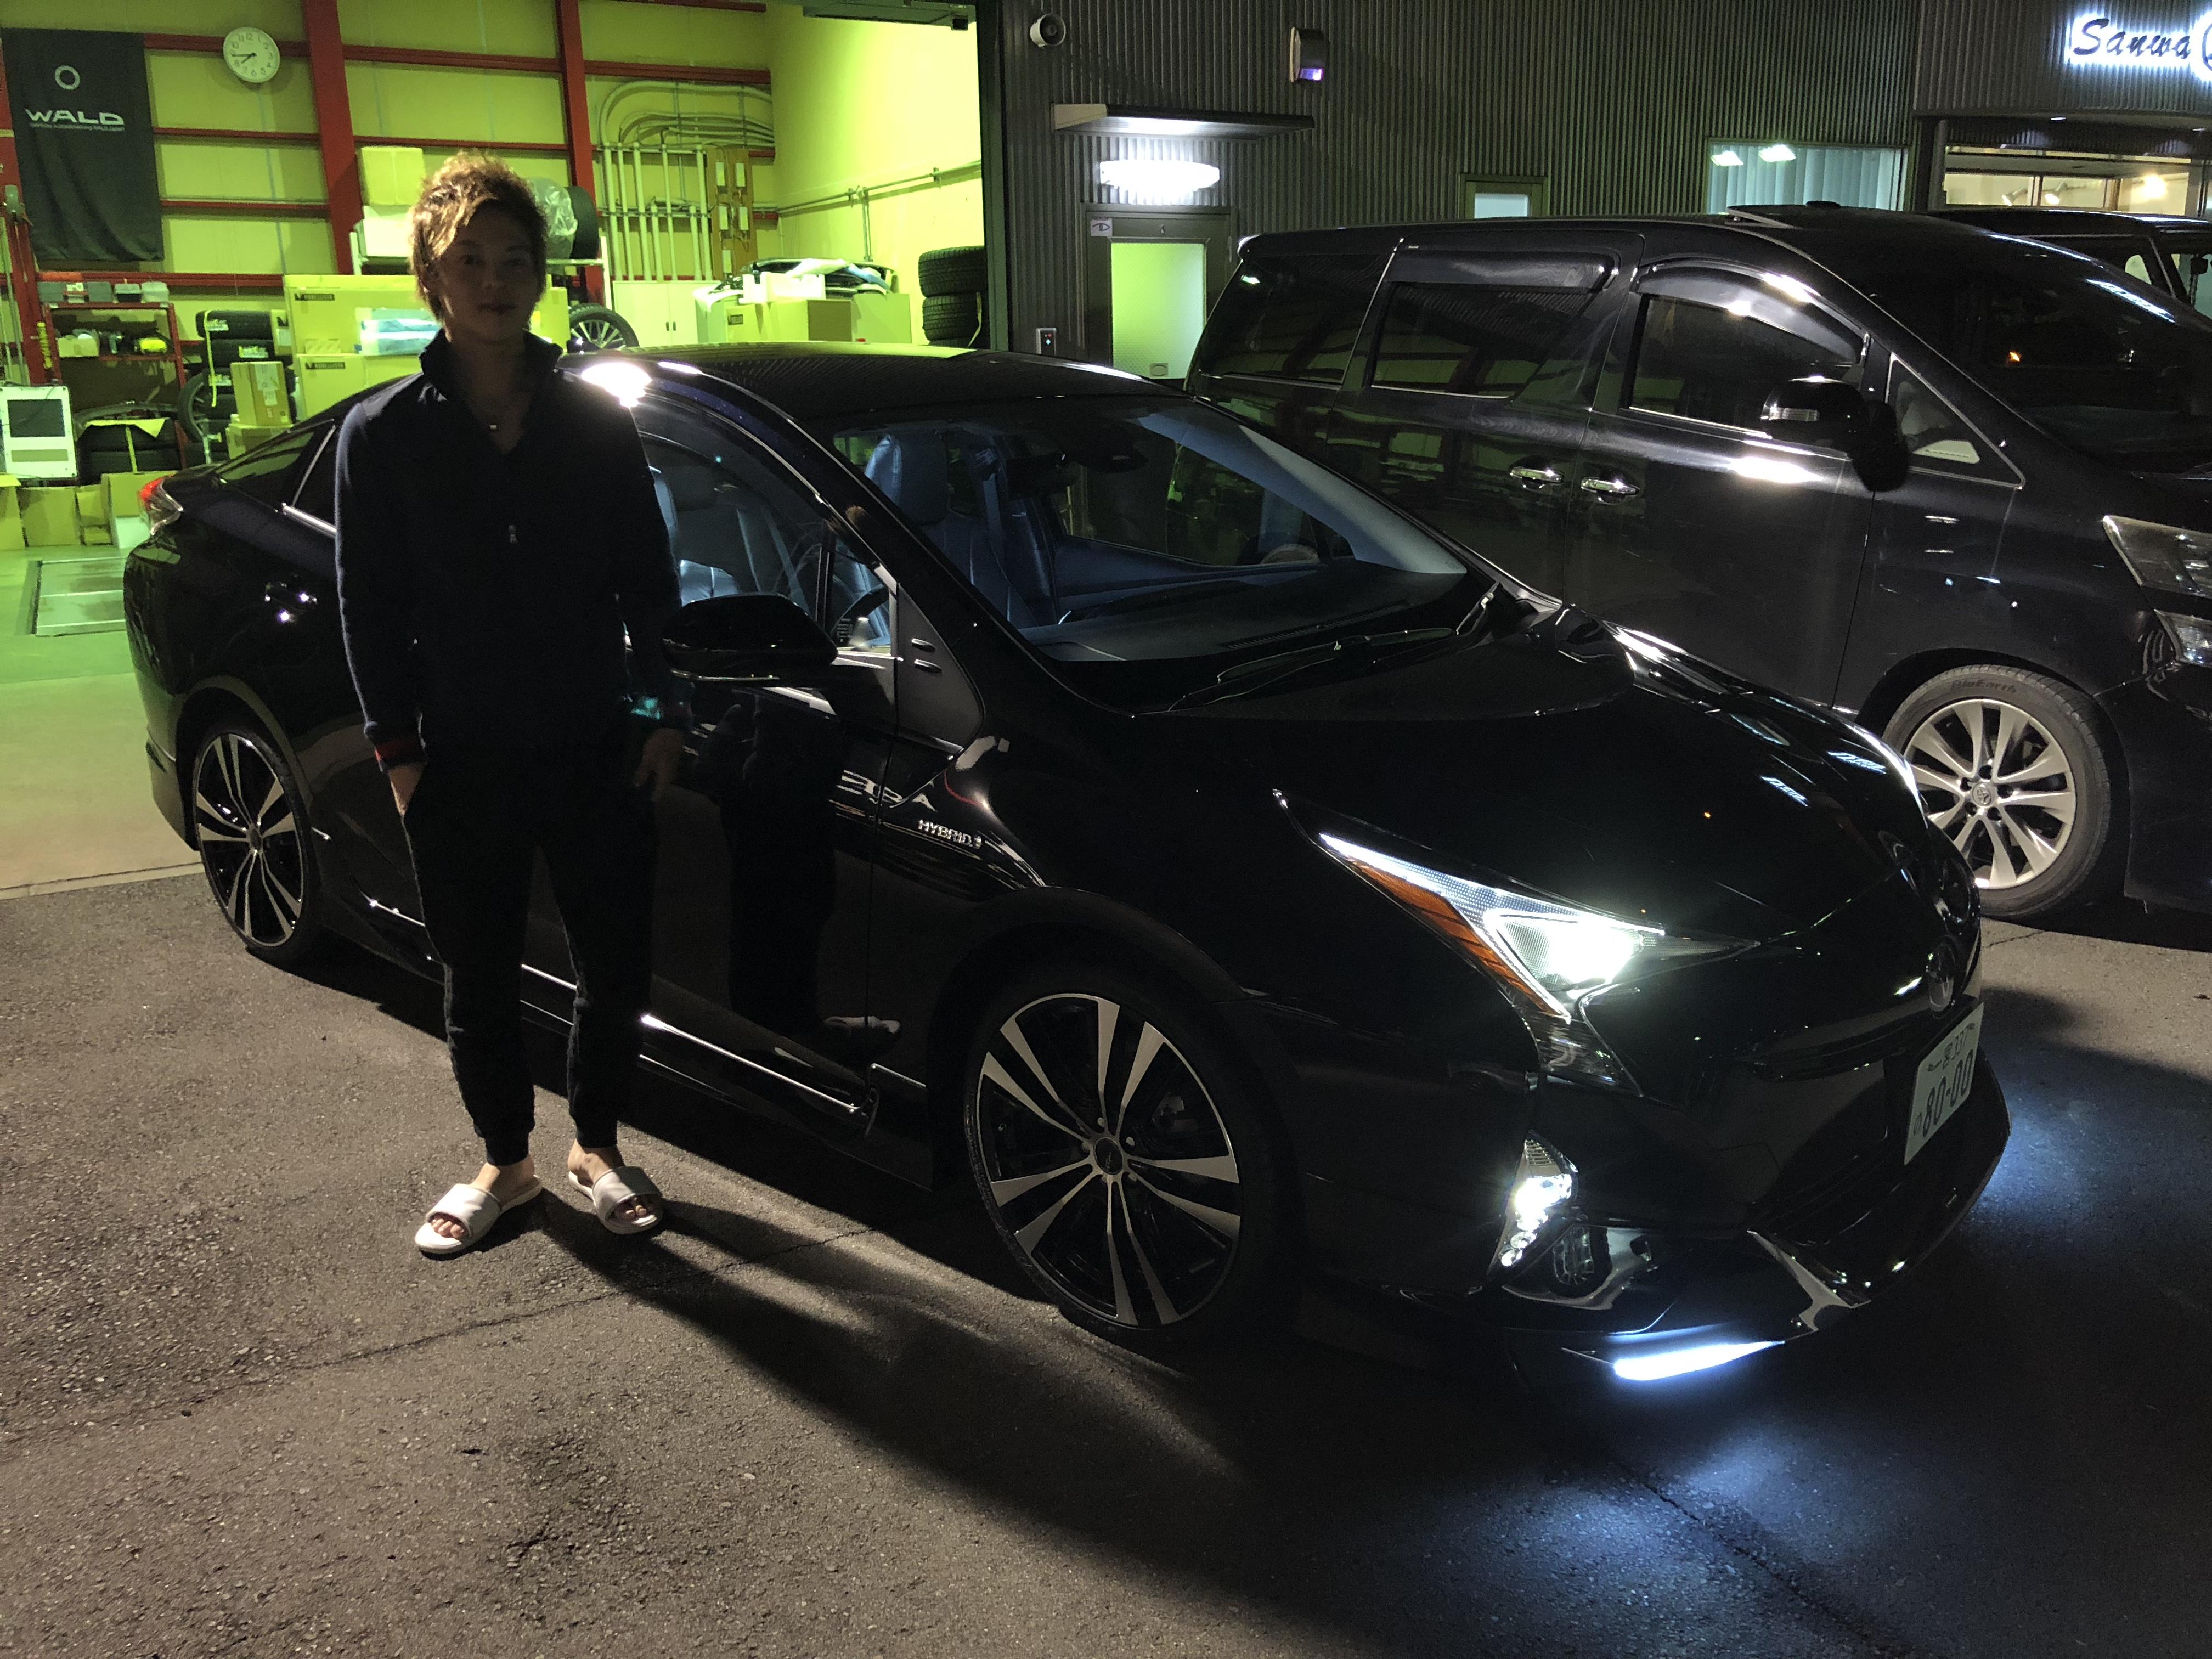 M様 新車プリウス 納車おめでとうございます!